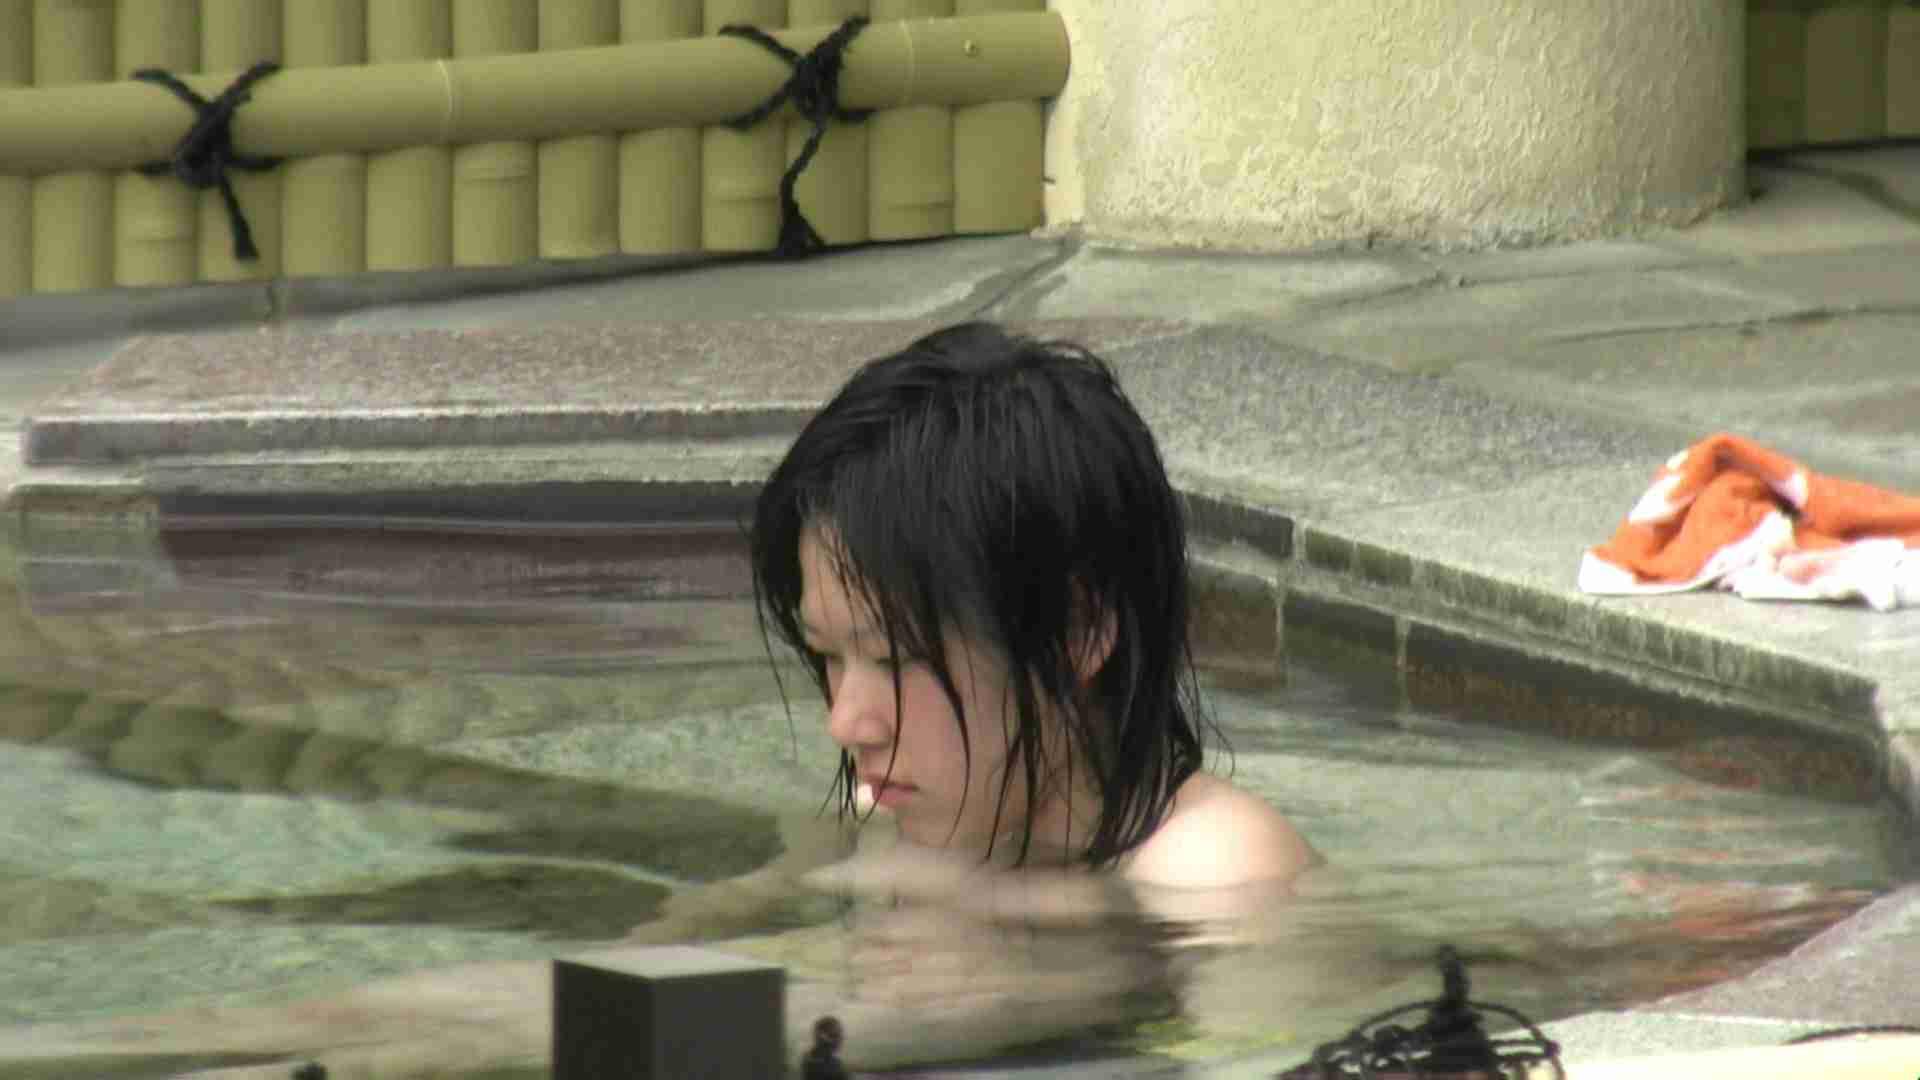 Aquaな露天風呂Vol.36 露天 のぞき動画画像 78連発 23